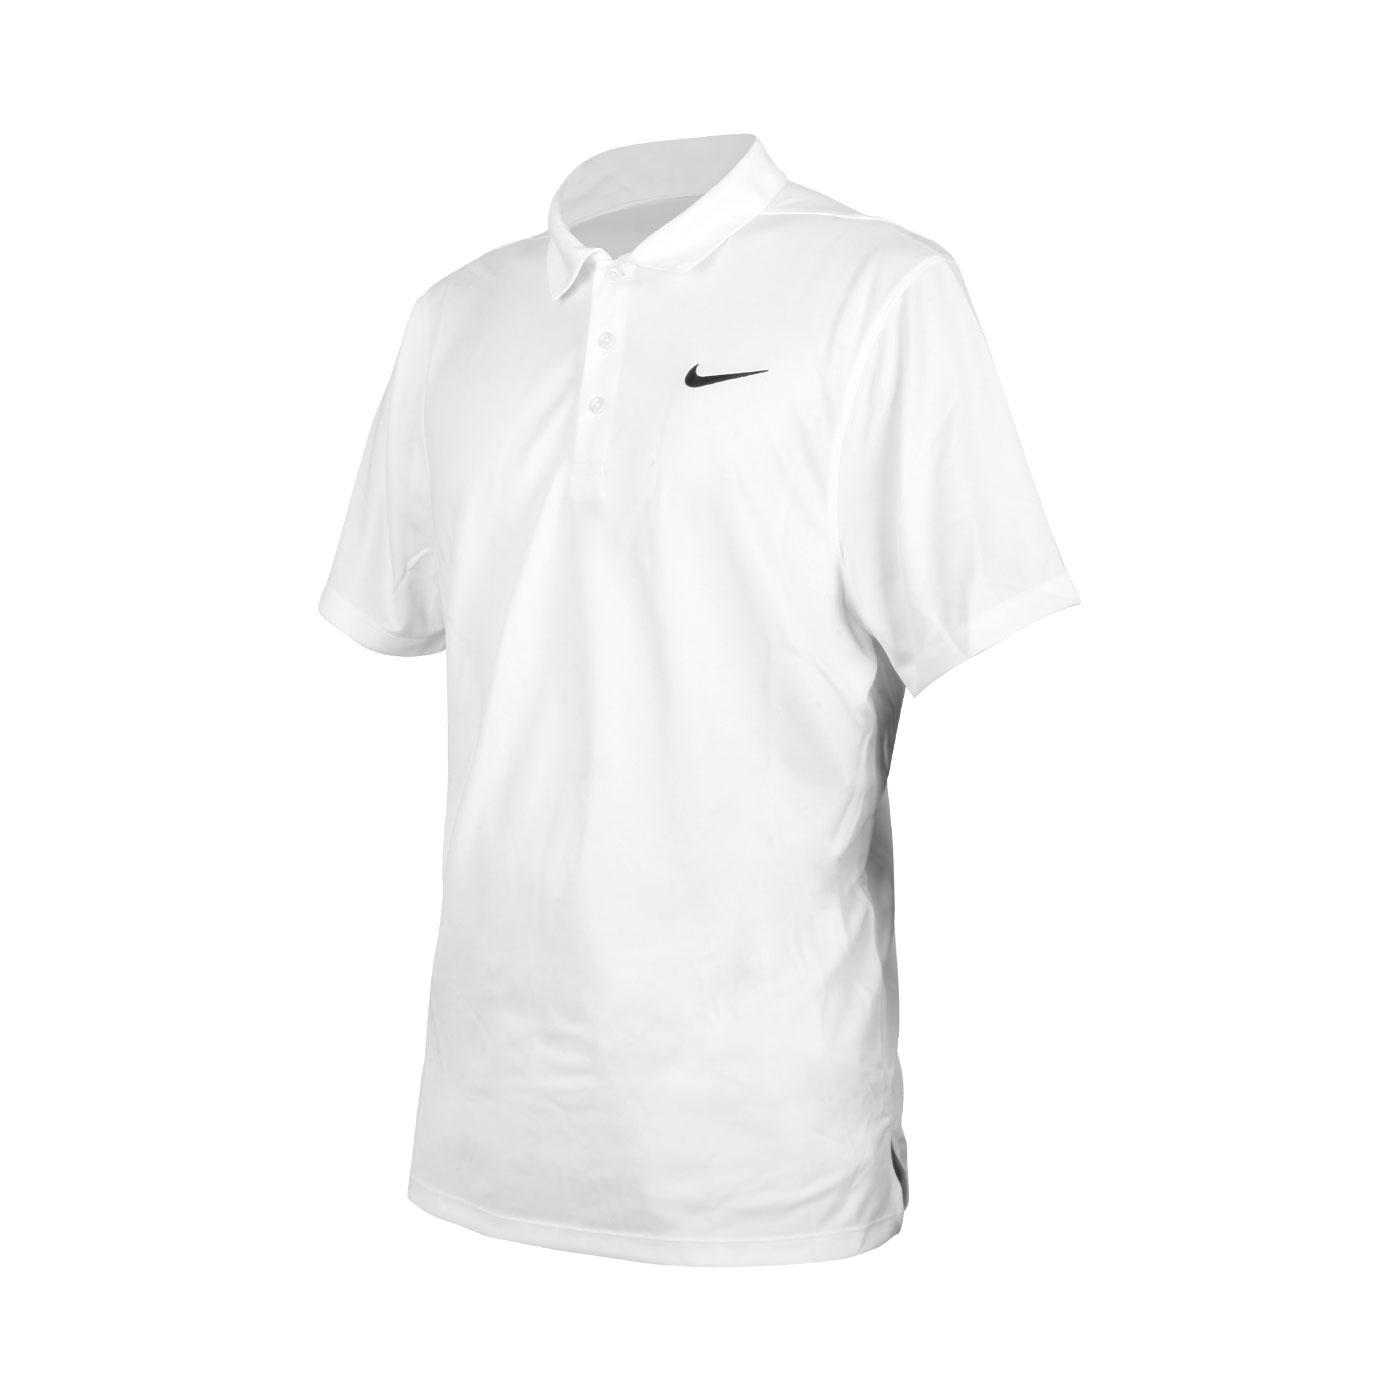 NIKE 男款短袖POLO衫 APS080-100